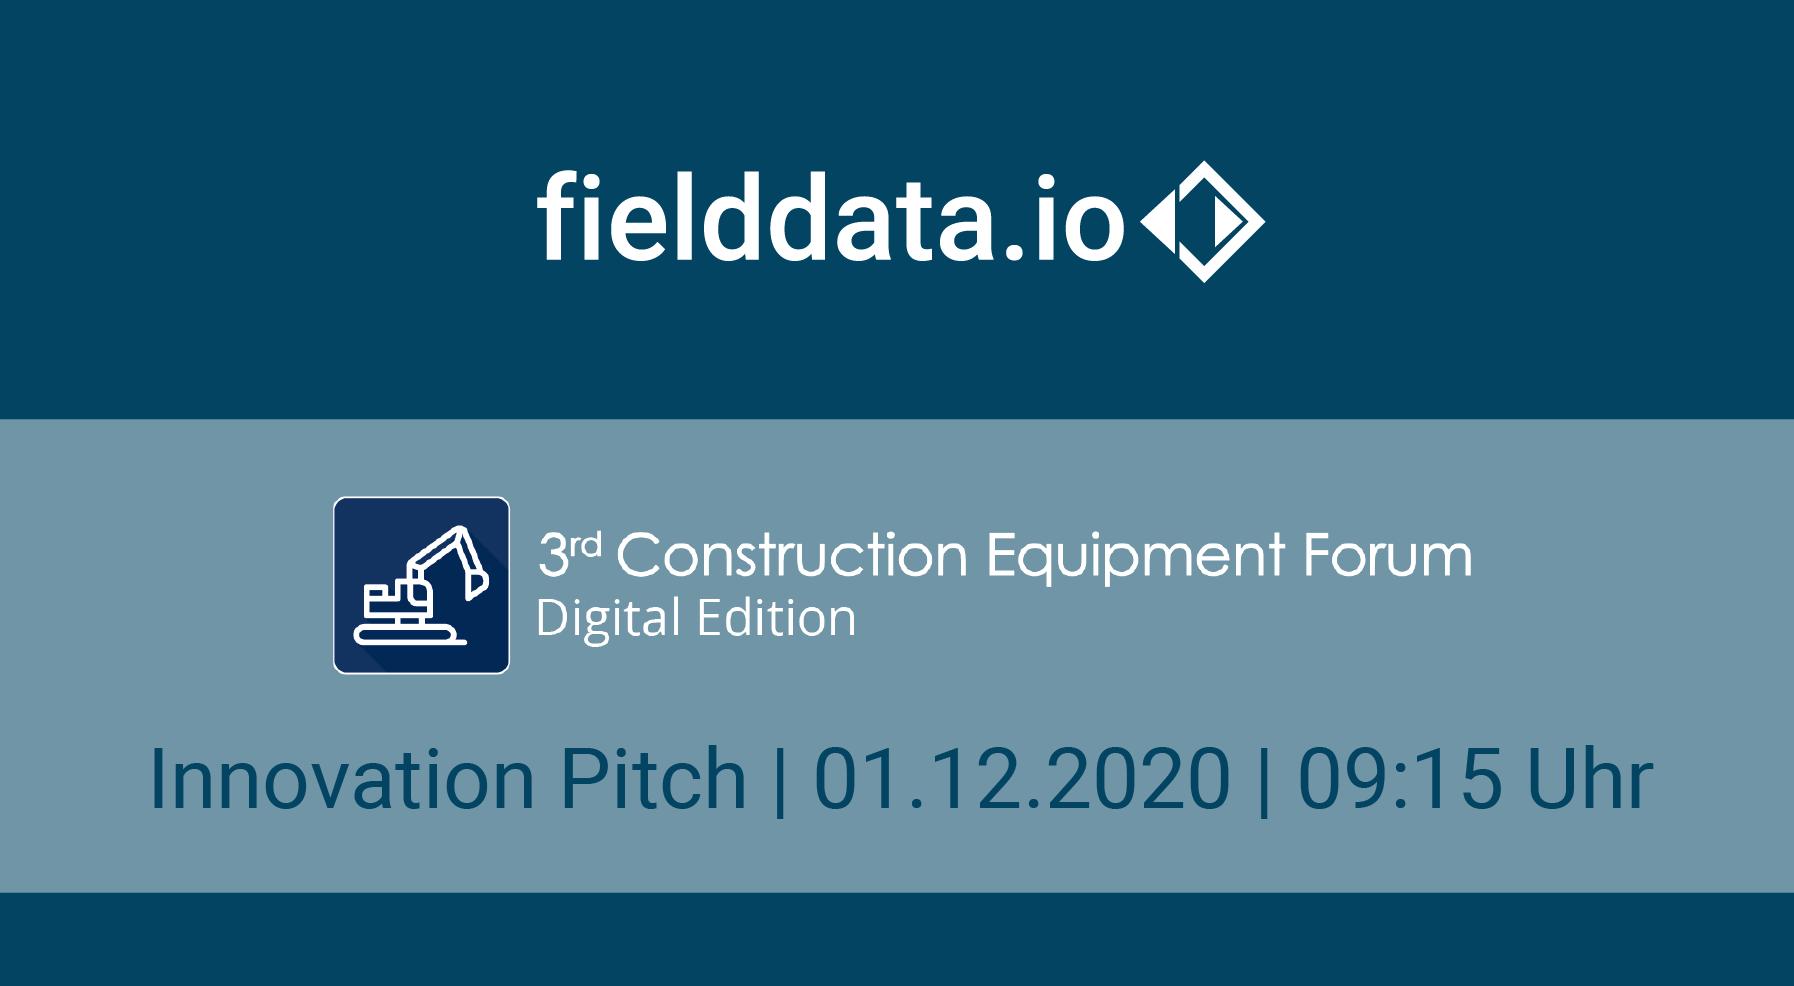 fielddata.io at the Construction Equipment Forum2020